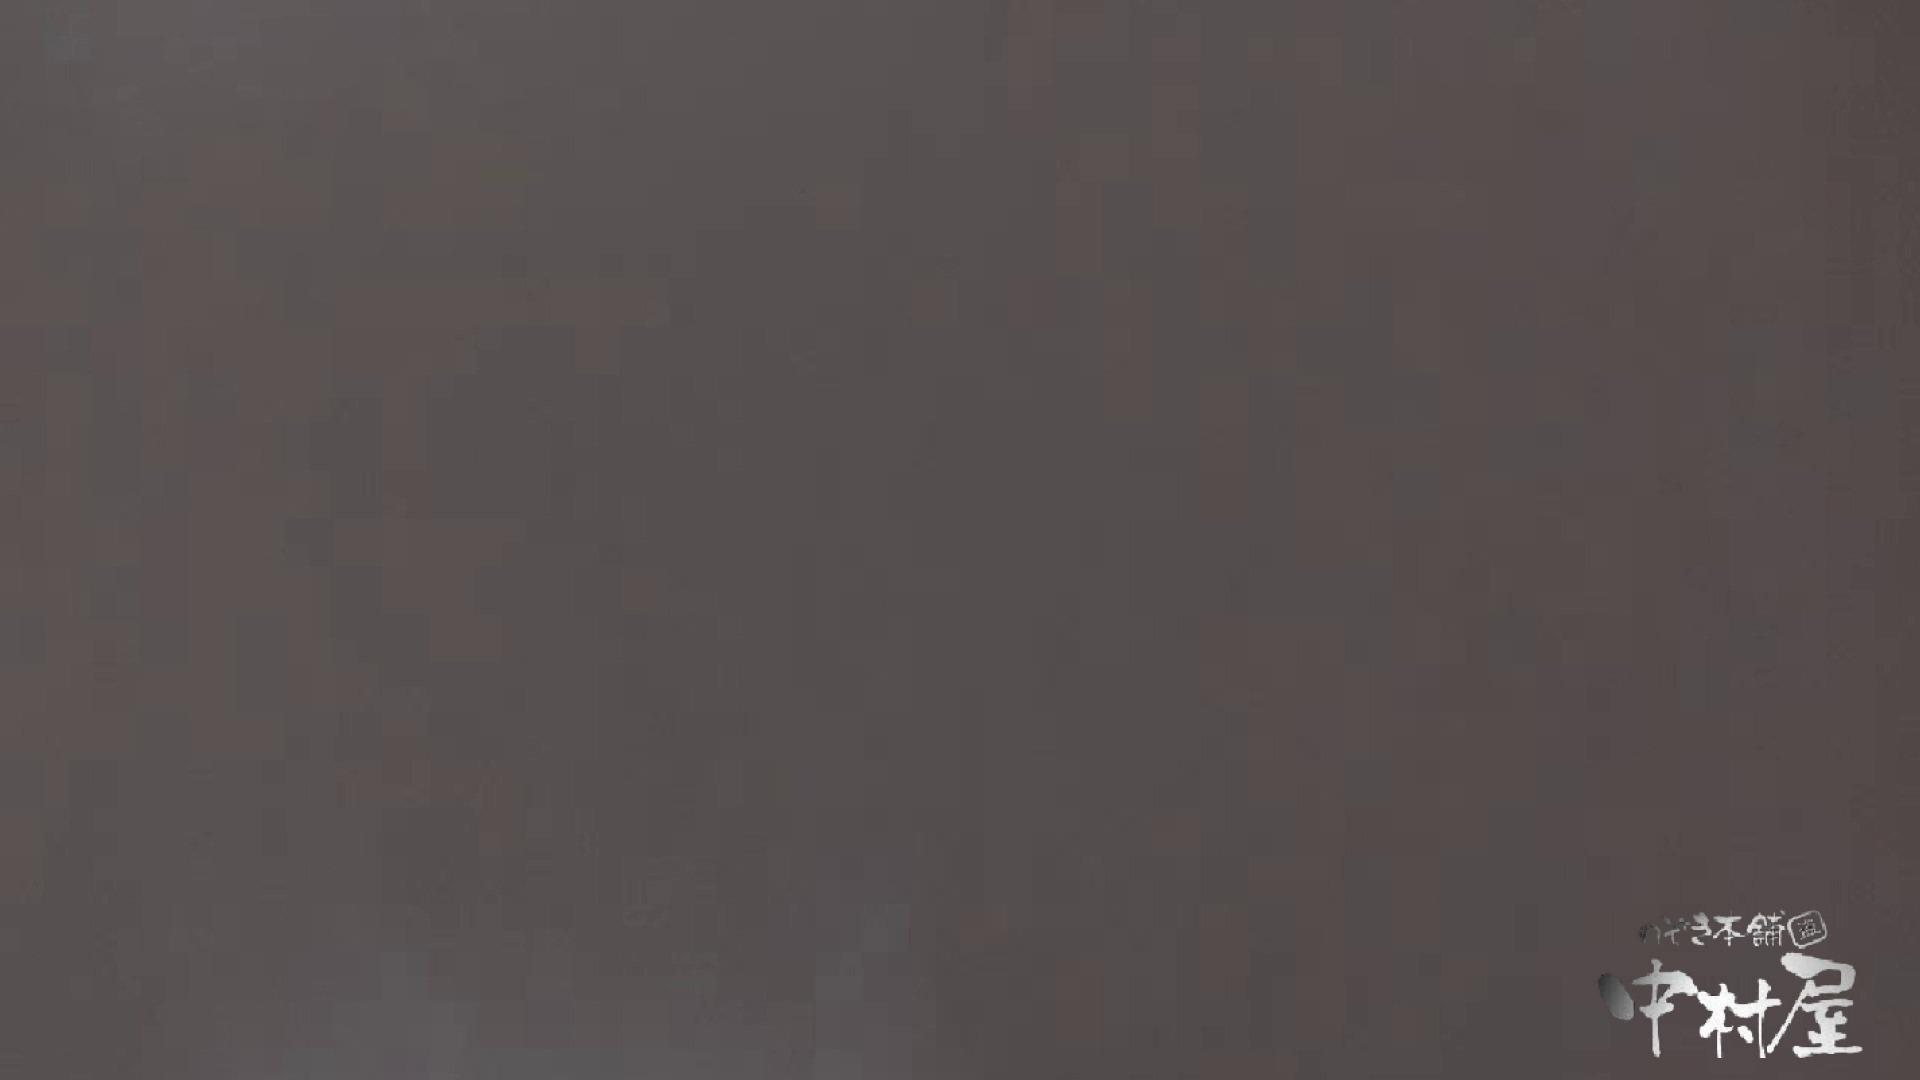 VIP配信している雅さんの独断と偏見で集めたVIP限定 動画集Vol.1一部公開 期間限定  53画像 10